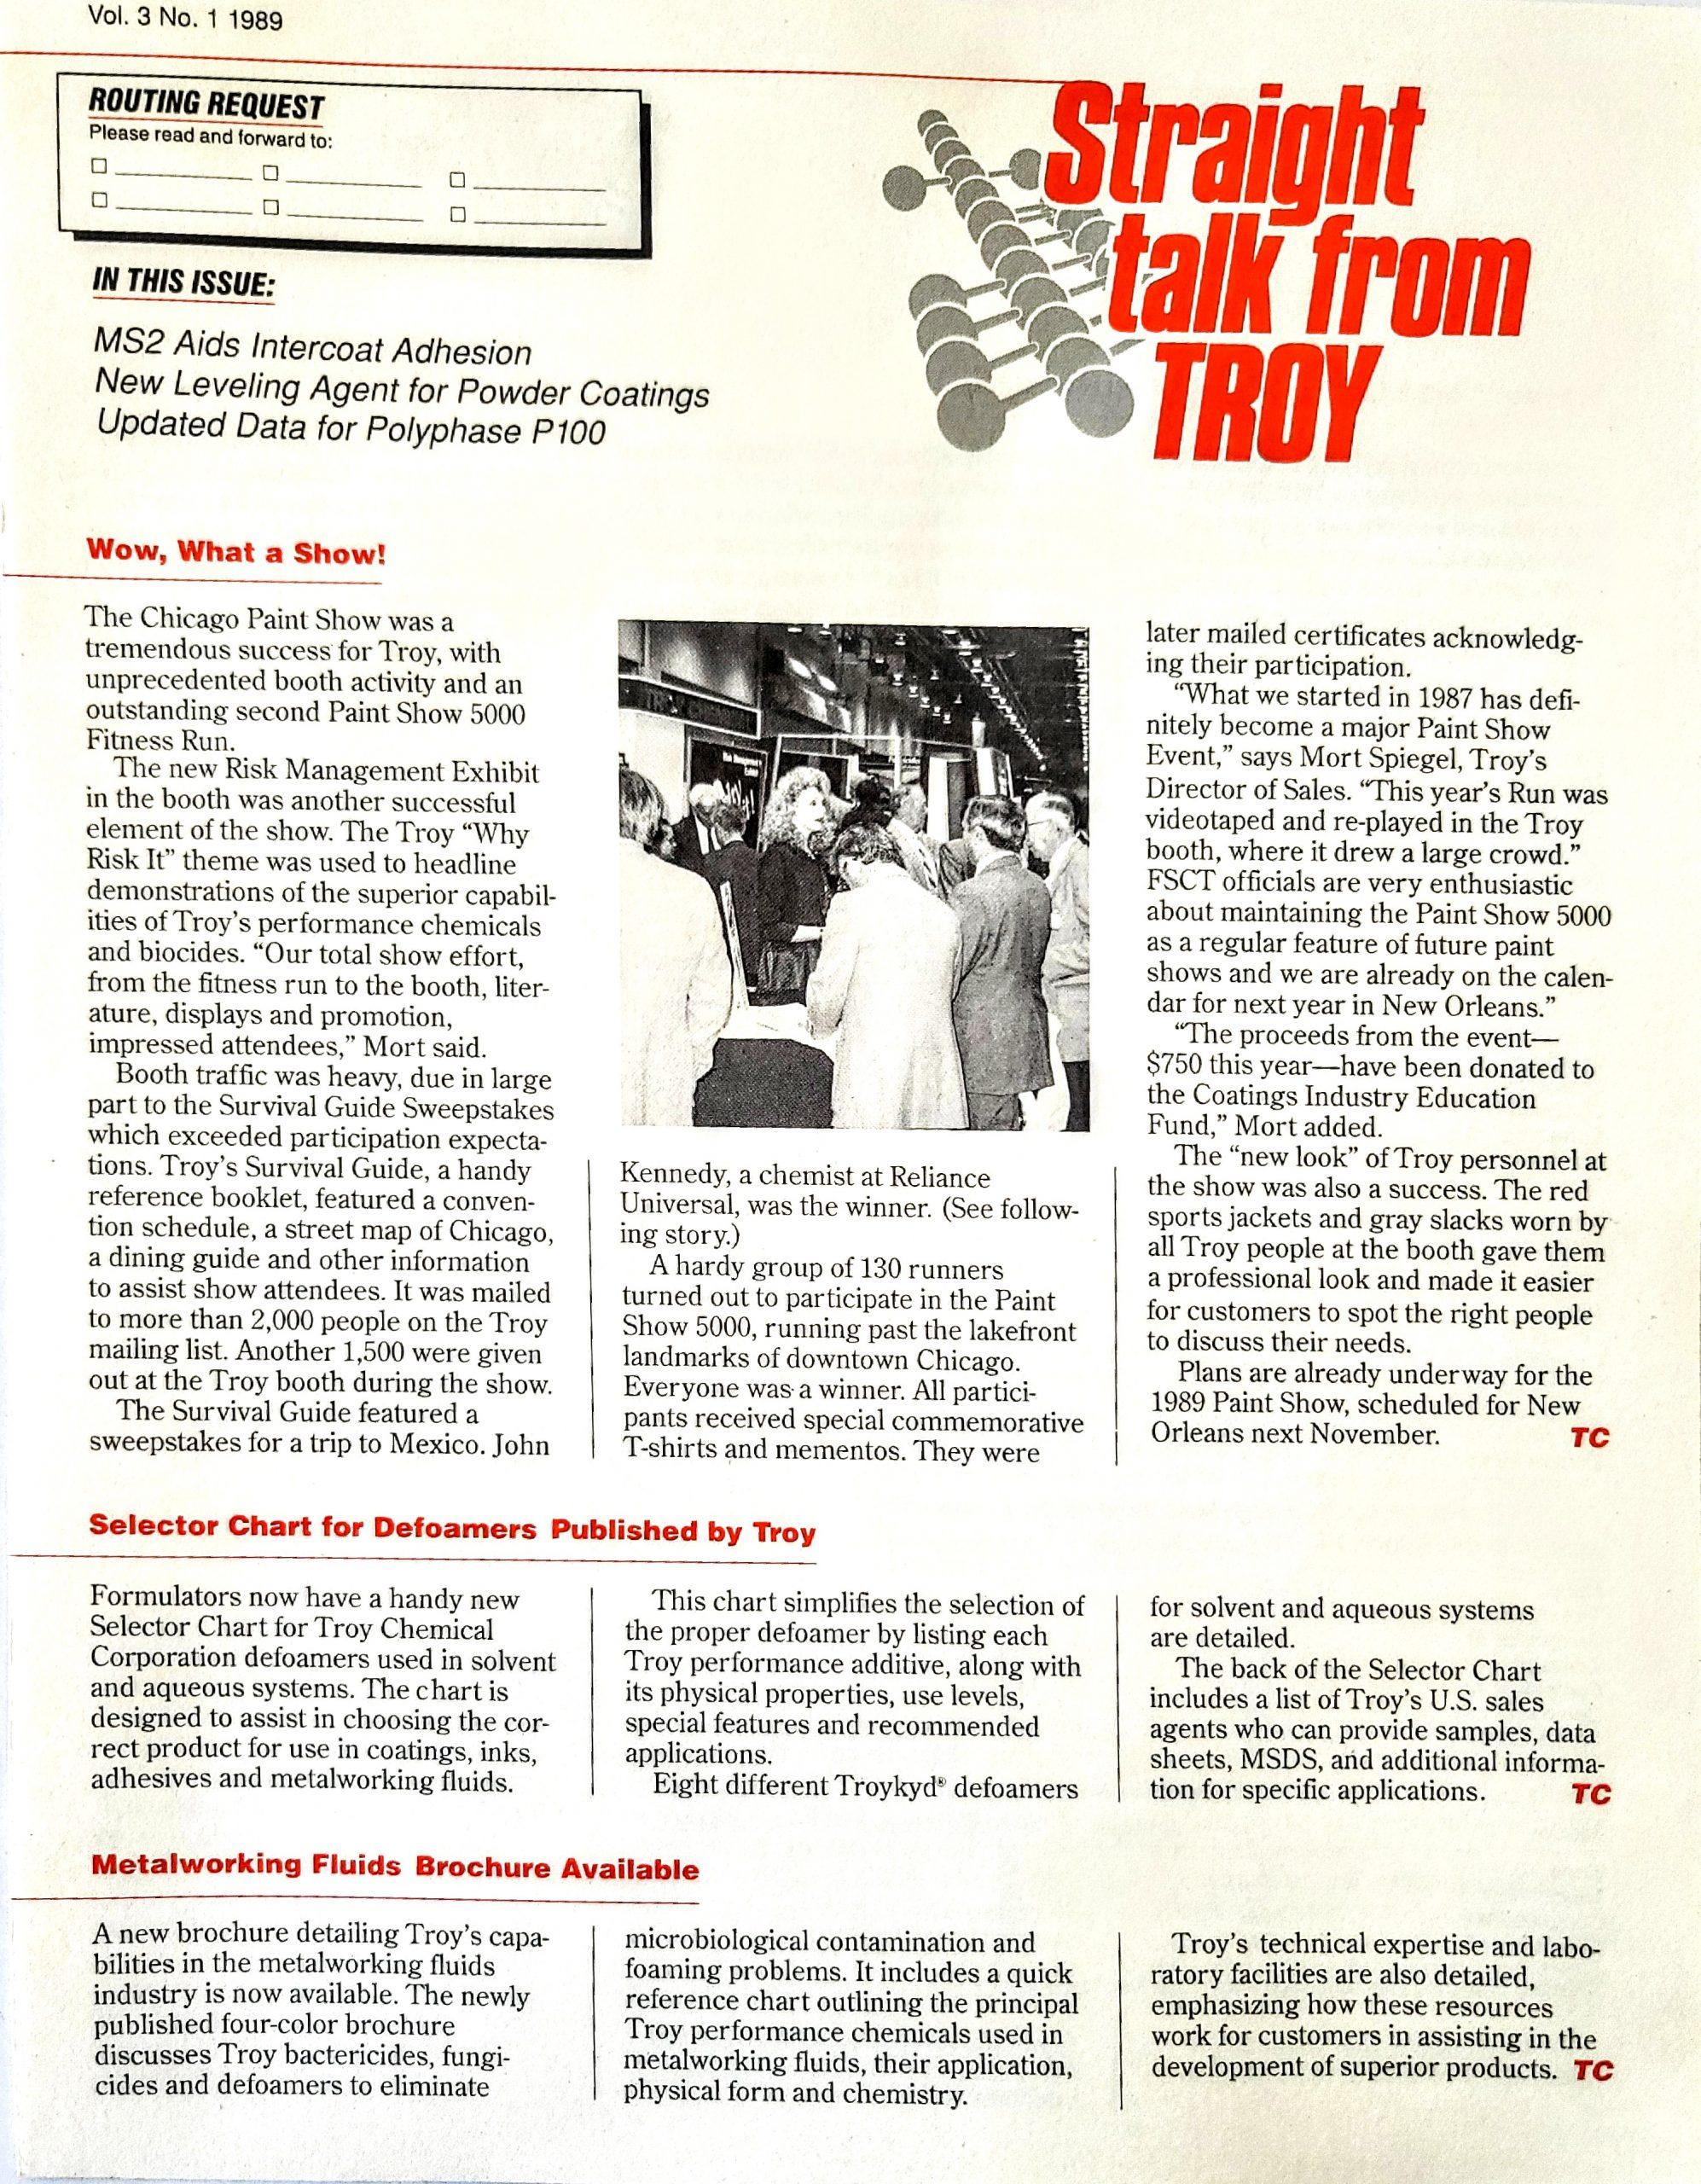 troy_straight talk newsletter_12